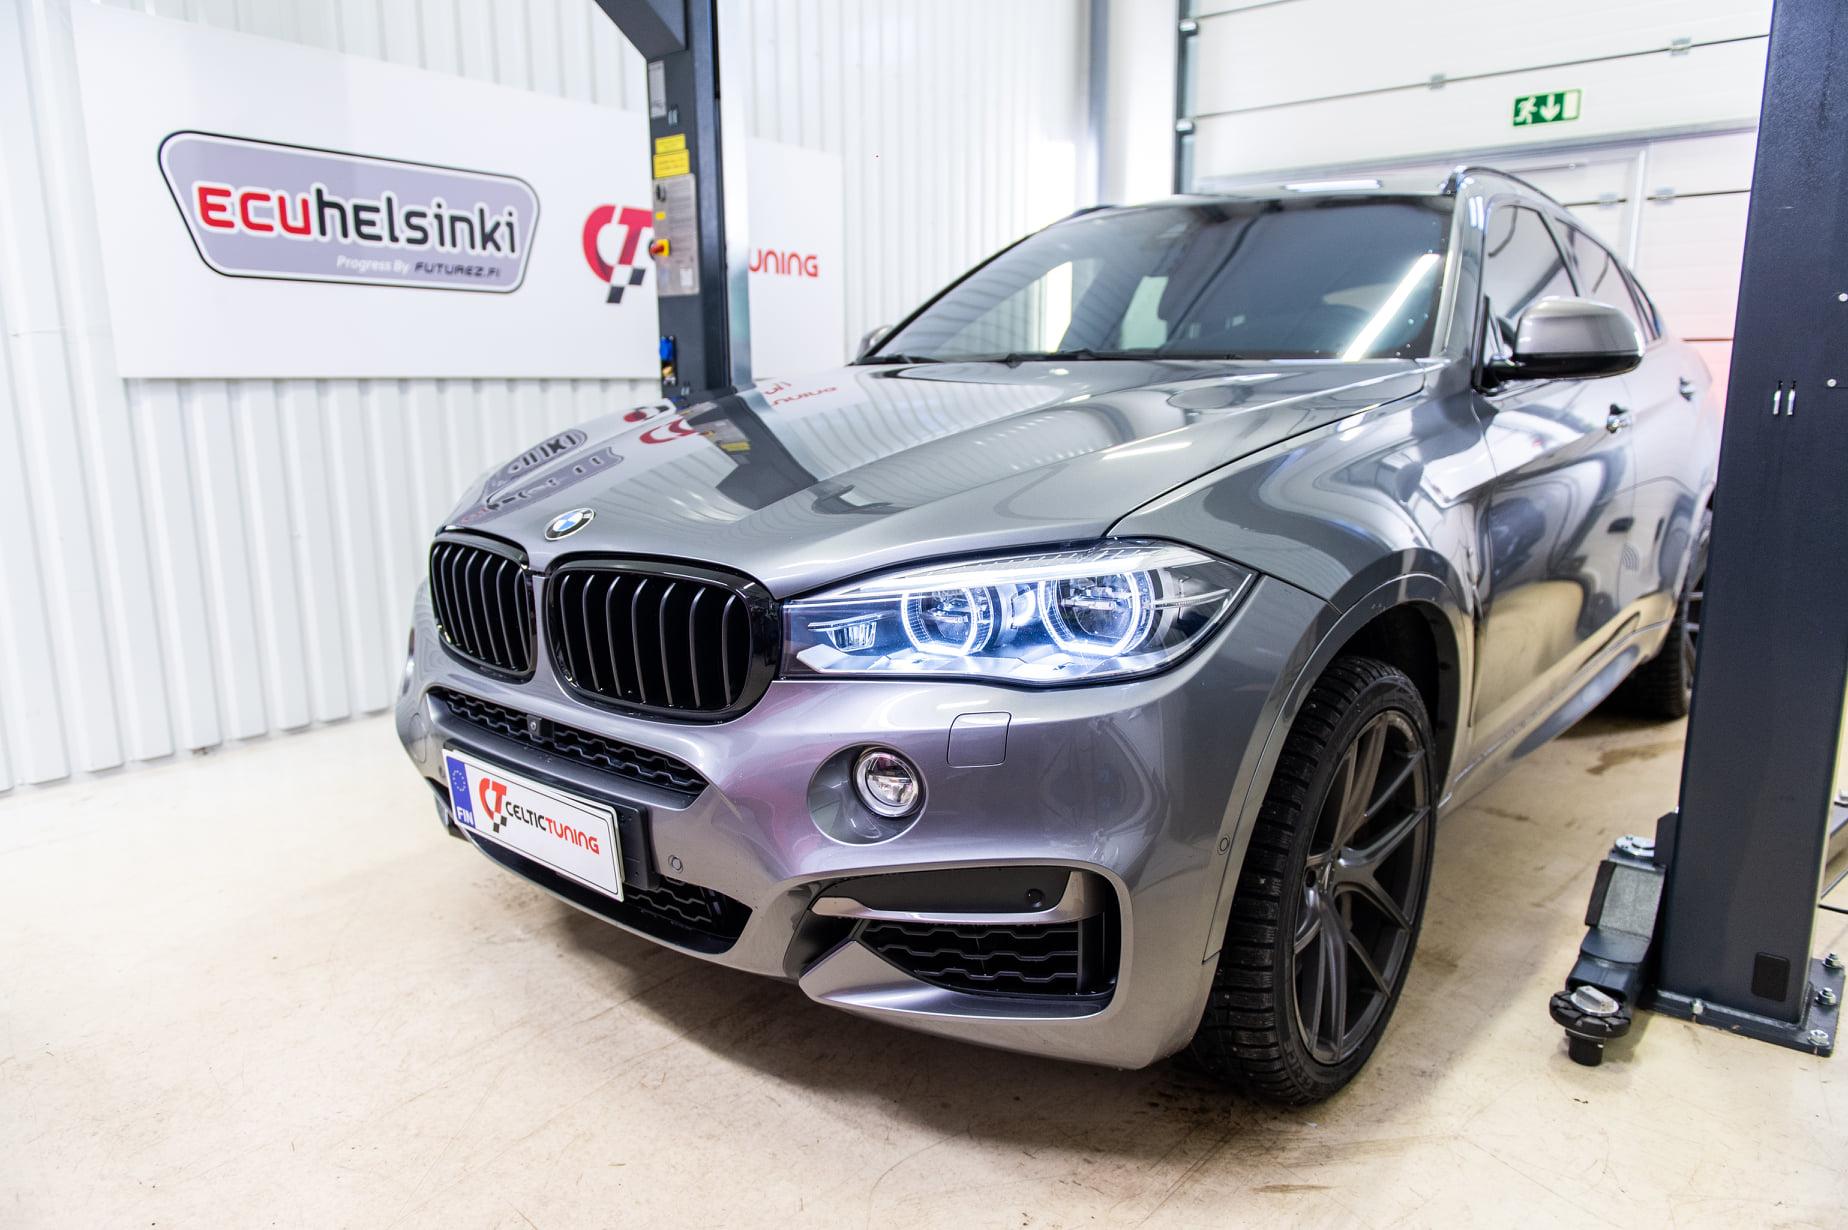 BMW X6 M50D ohjelmointi celtic tuning